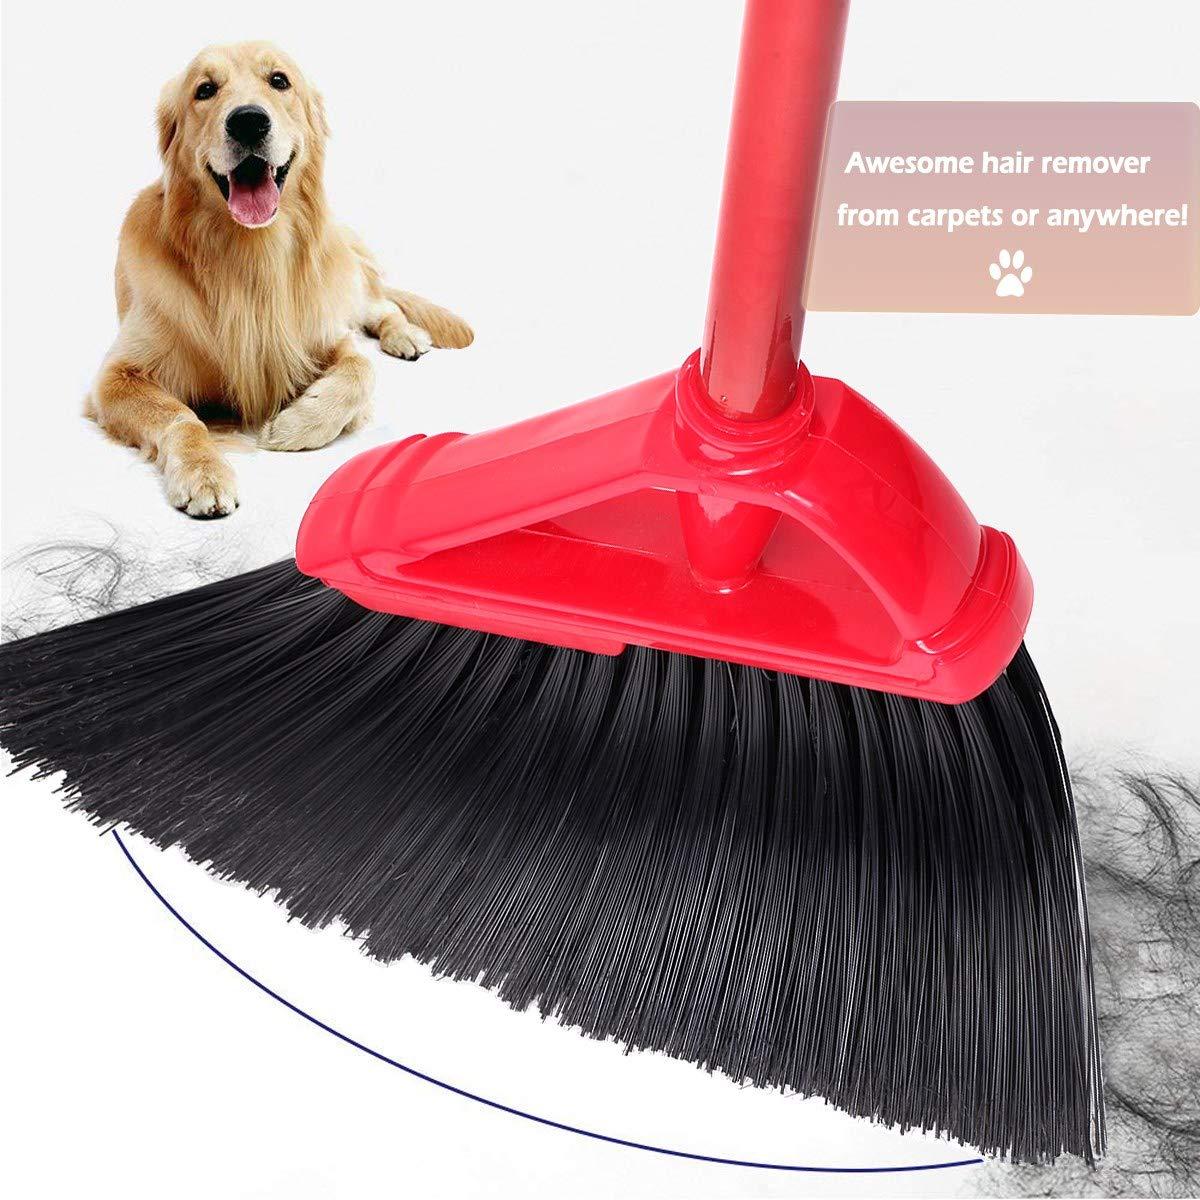 Angle Broom Dustpan Set Rubber Lip Detachable Hand Broom Indoor Outdoor Floor Sweeper Lobby Kitchen Patio Garden Garage Shop Hair Salon by Iamagie (Image #4)